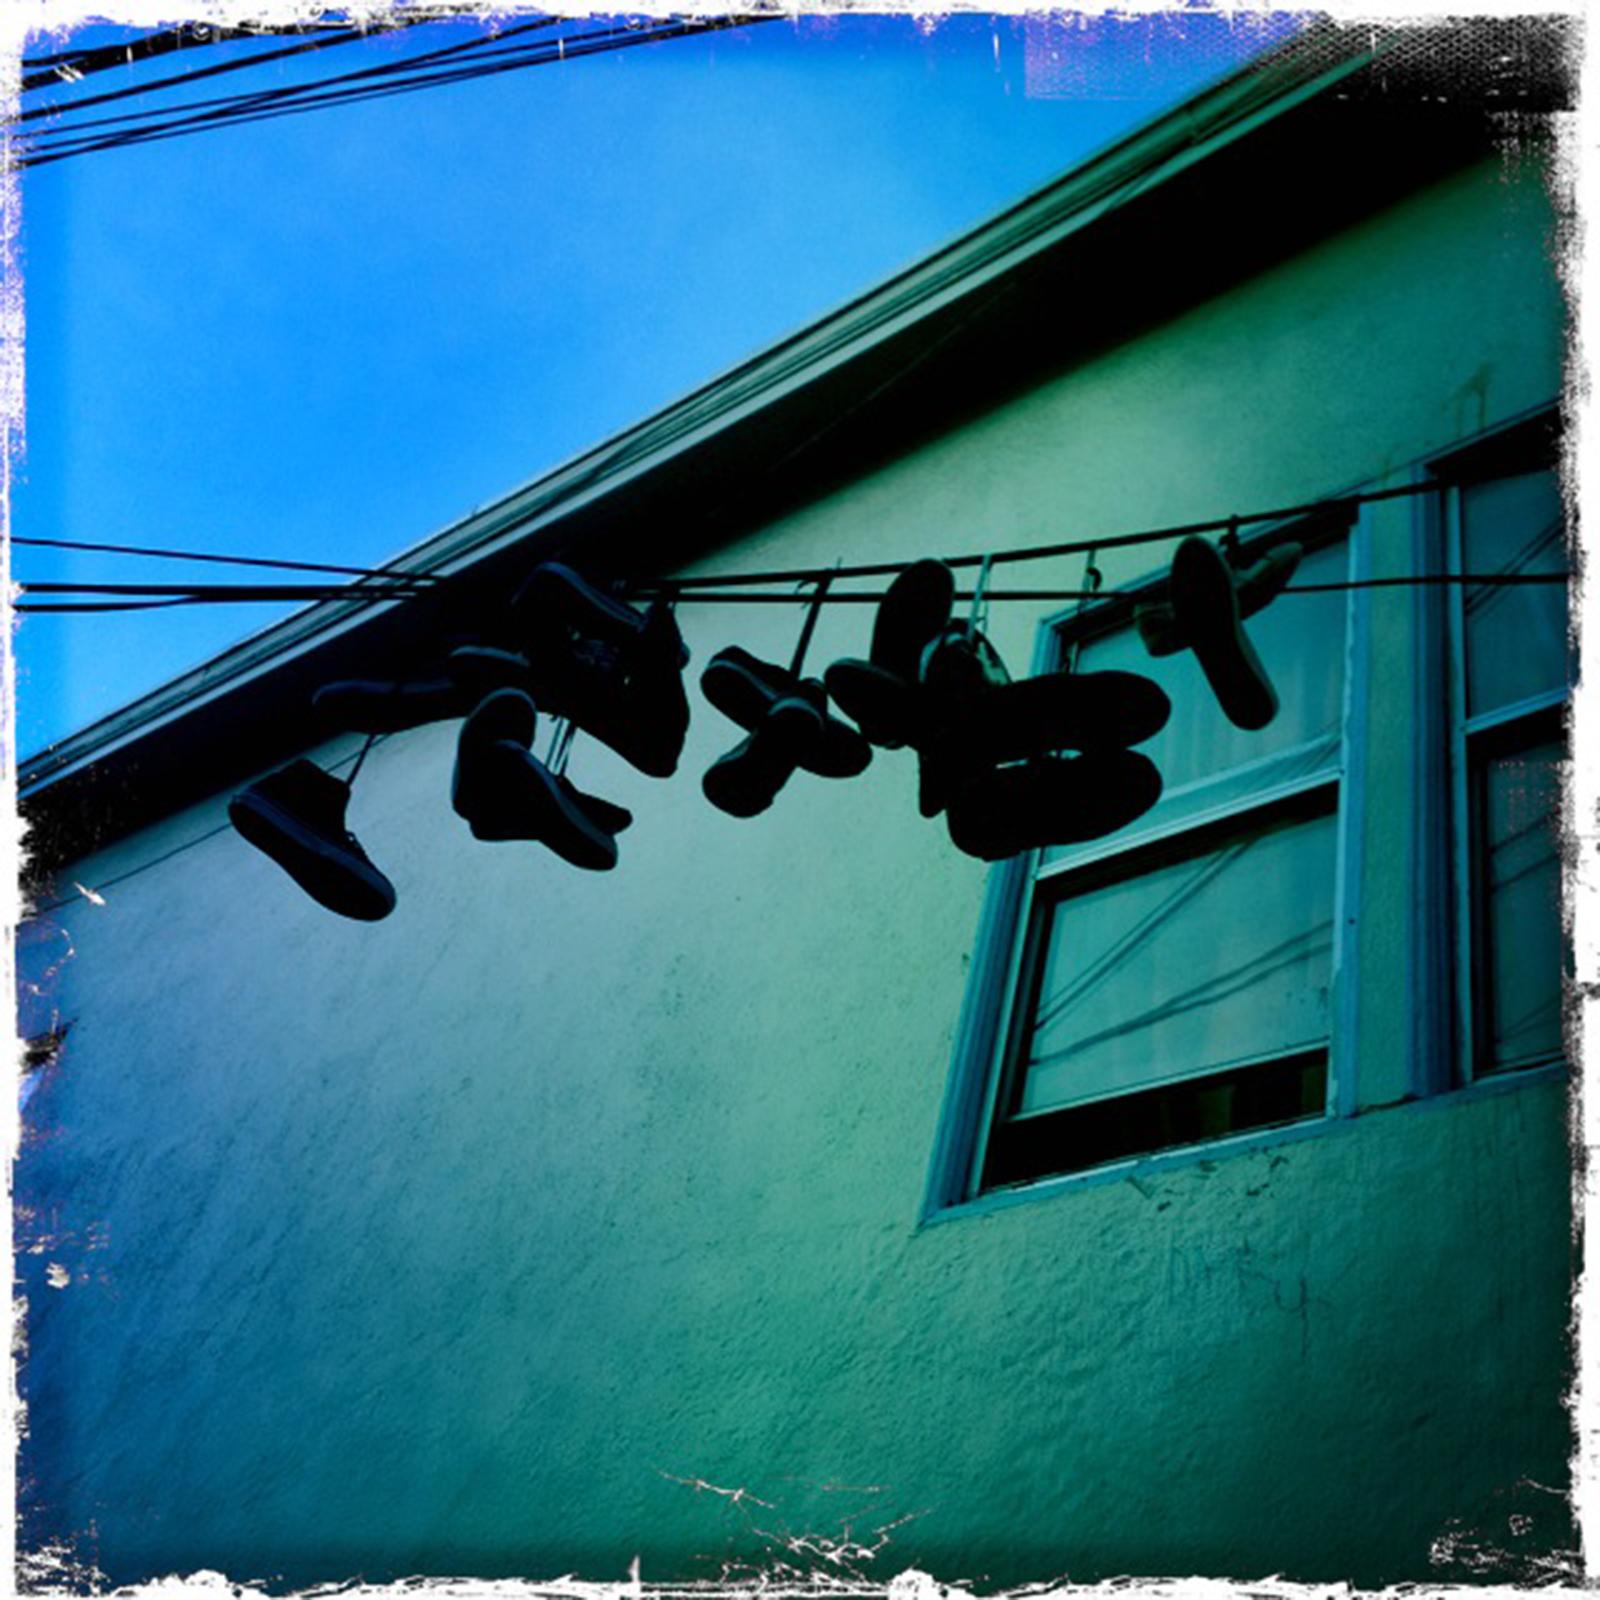 SNAP: Like a Shoe on a Wire